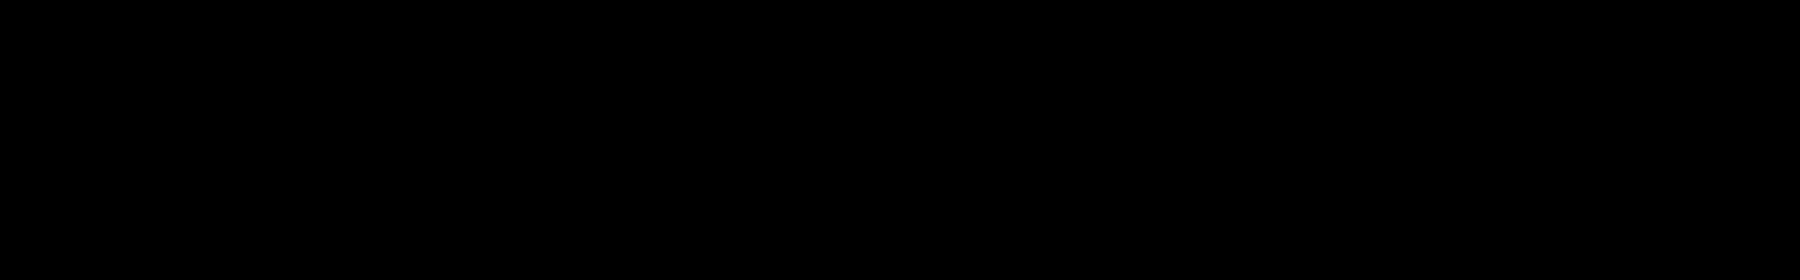 KASHMIR ETHNIC EDM audio waveform